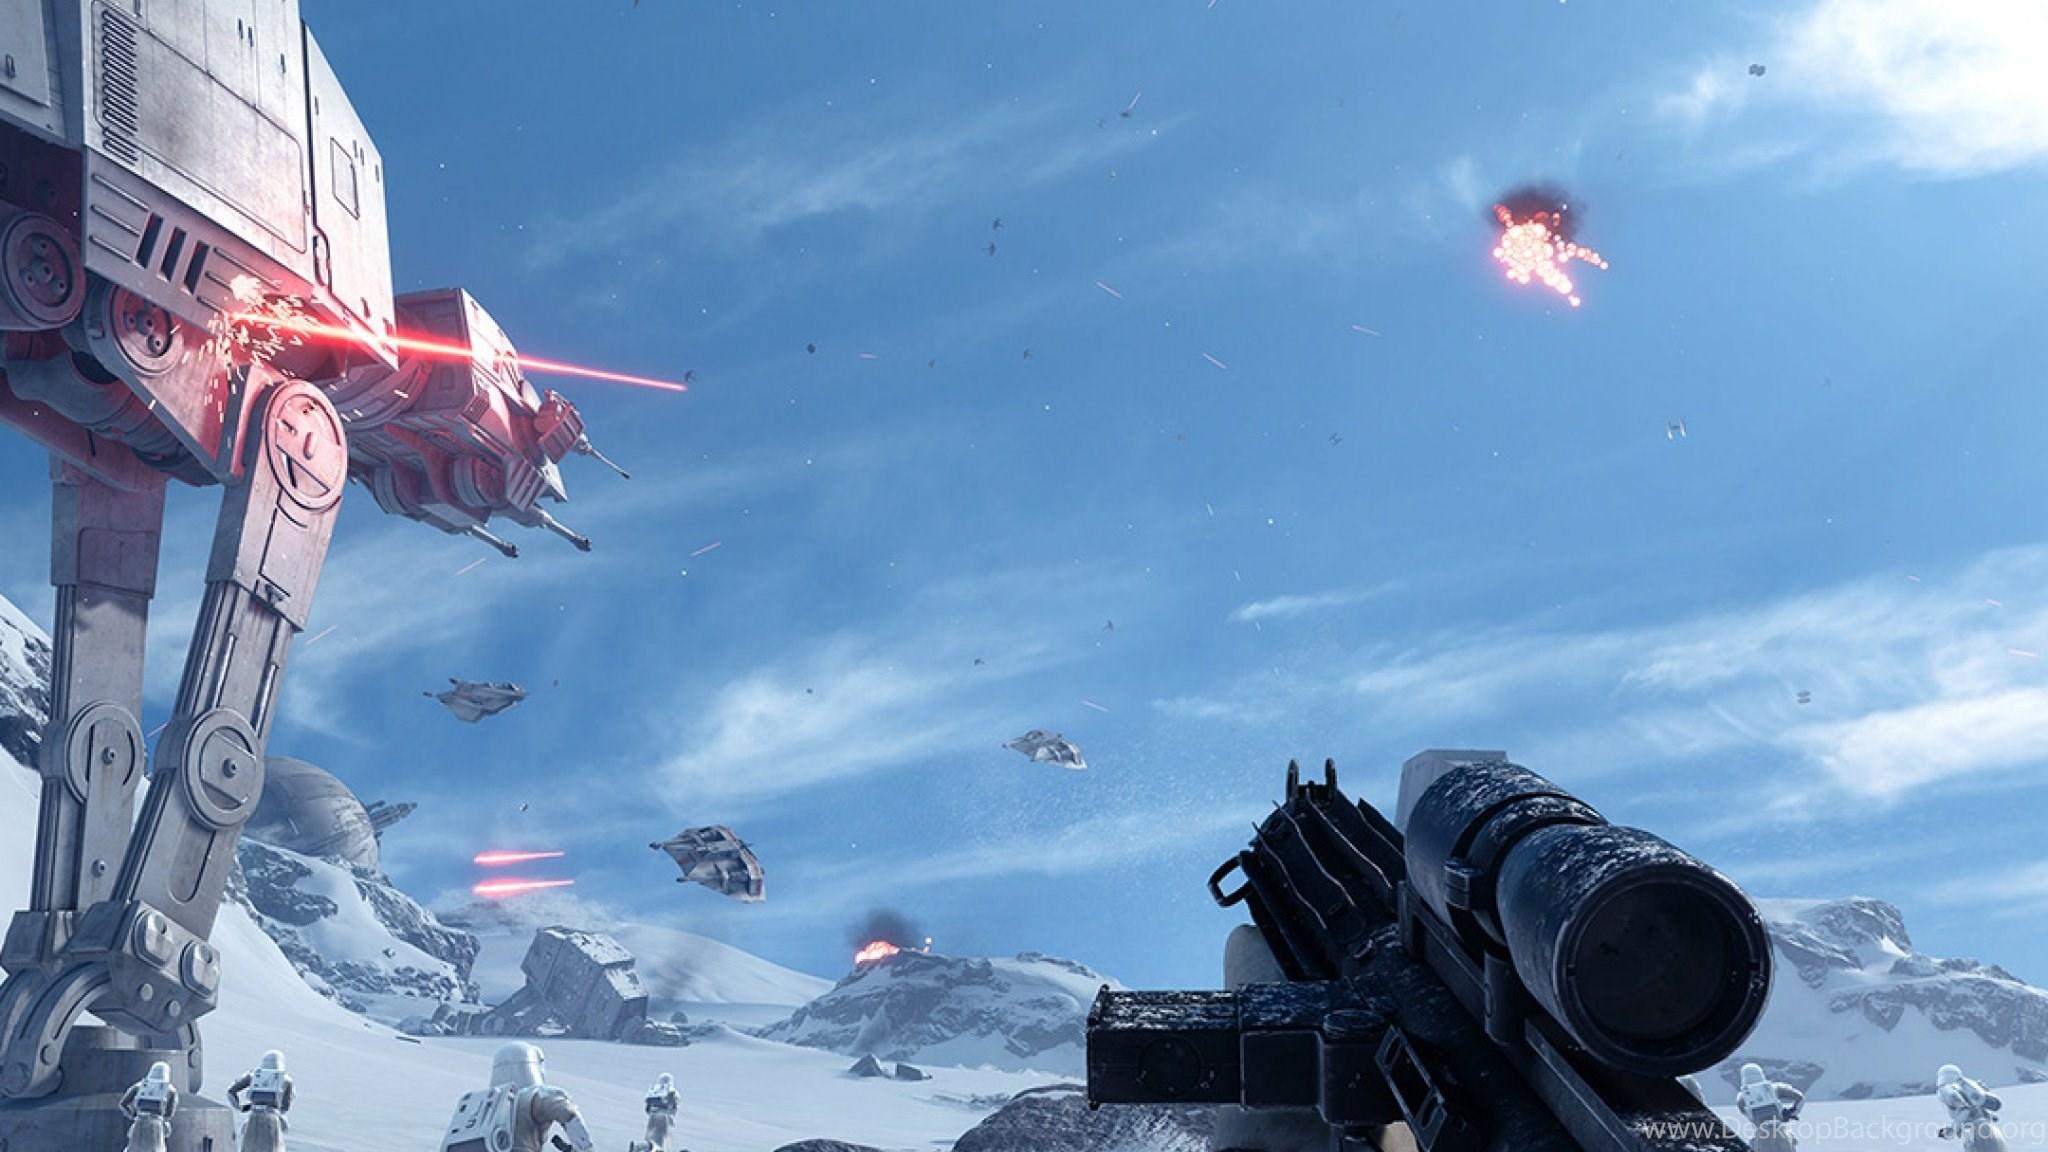 Star Wars Battlefront Ipad 3 4 Air Wallpapers Desktop Background